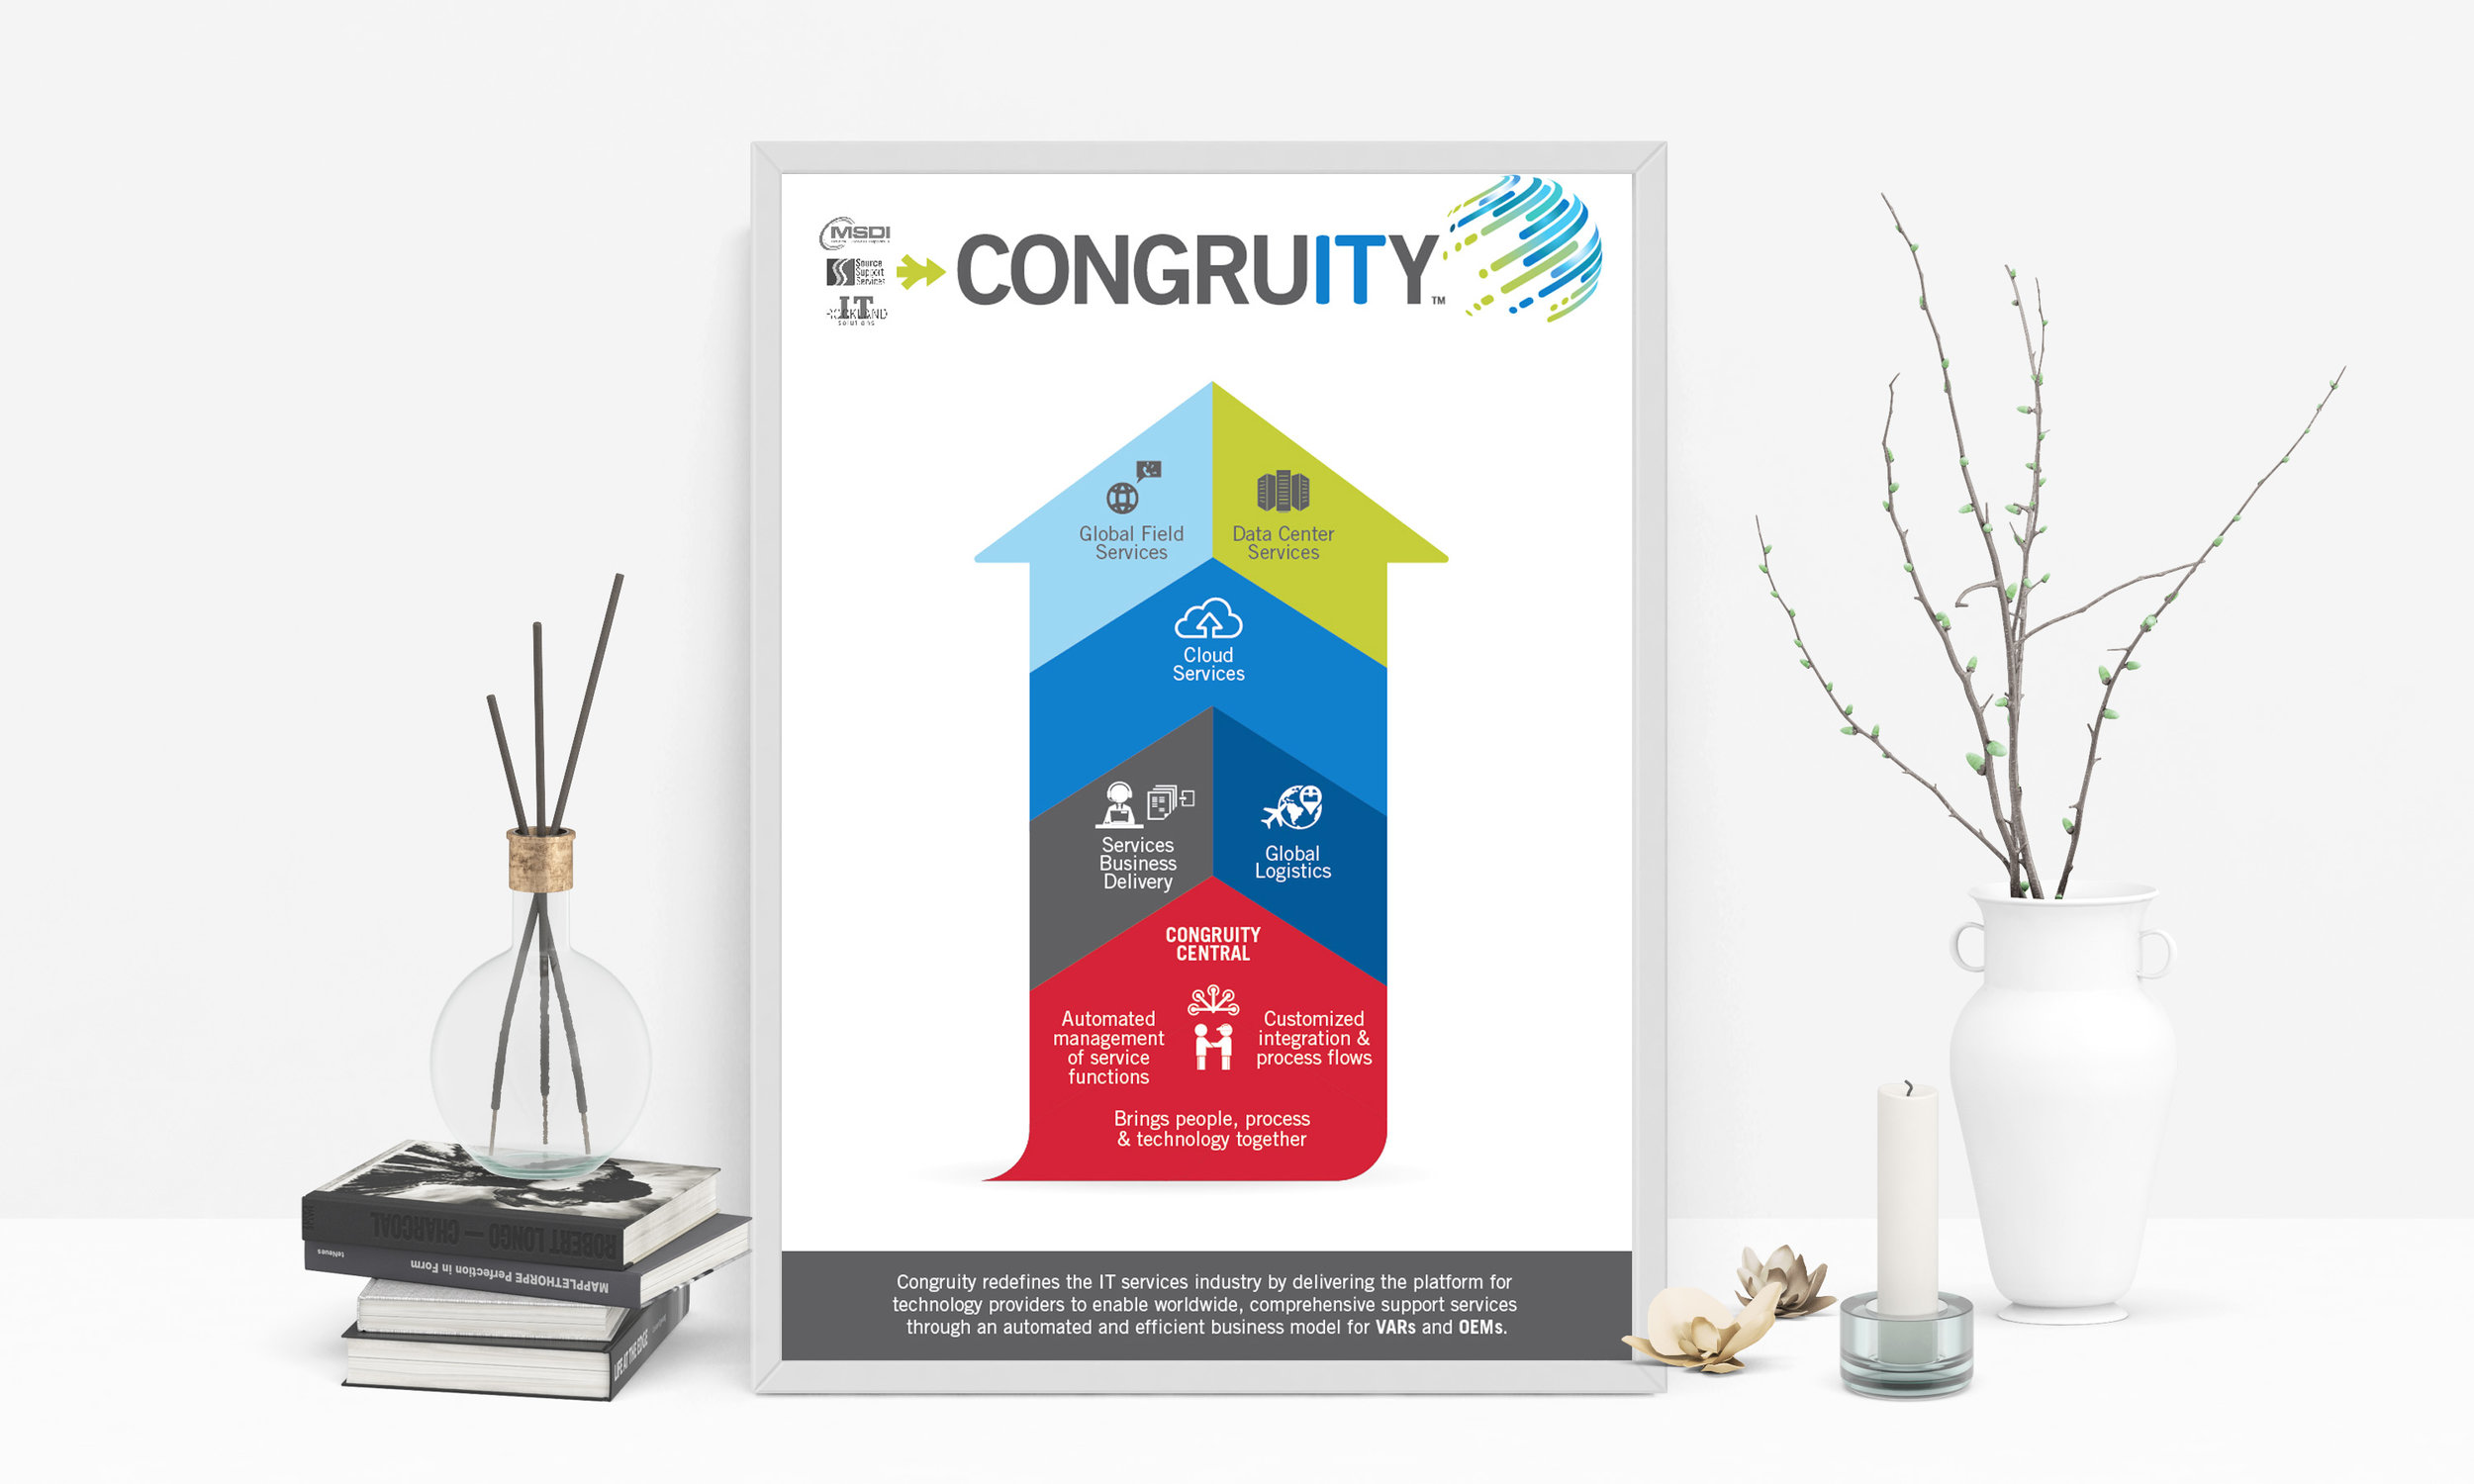 Congruity_Infographic.jpg